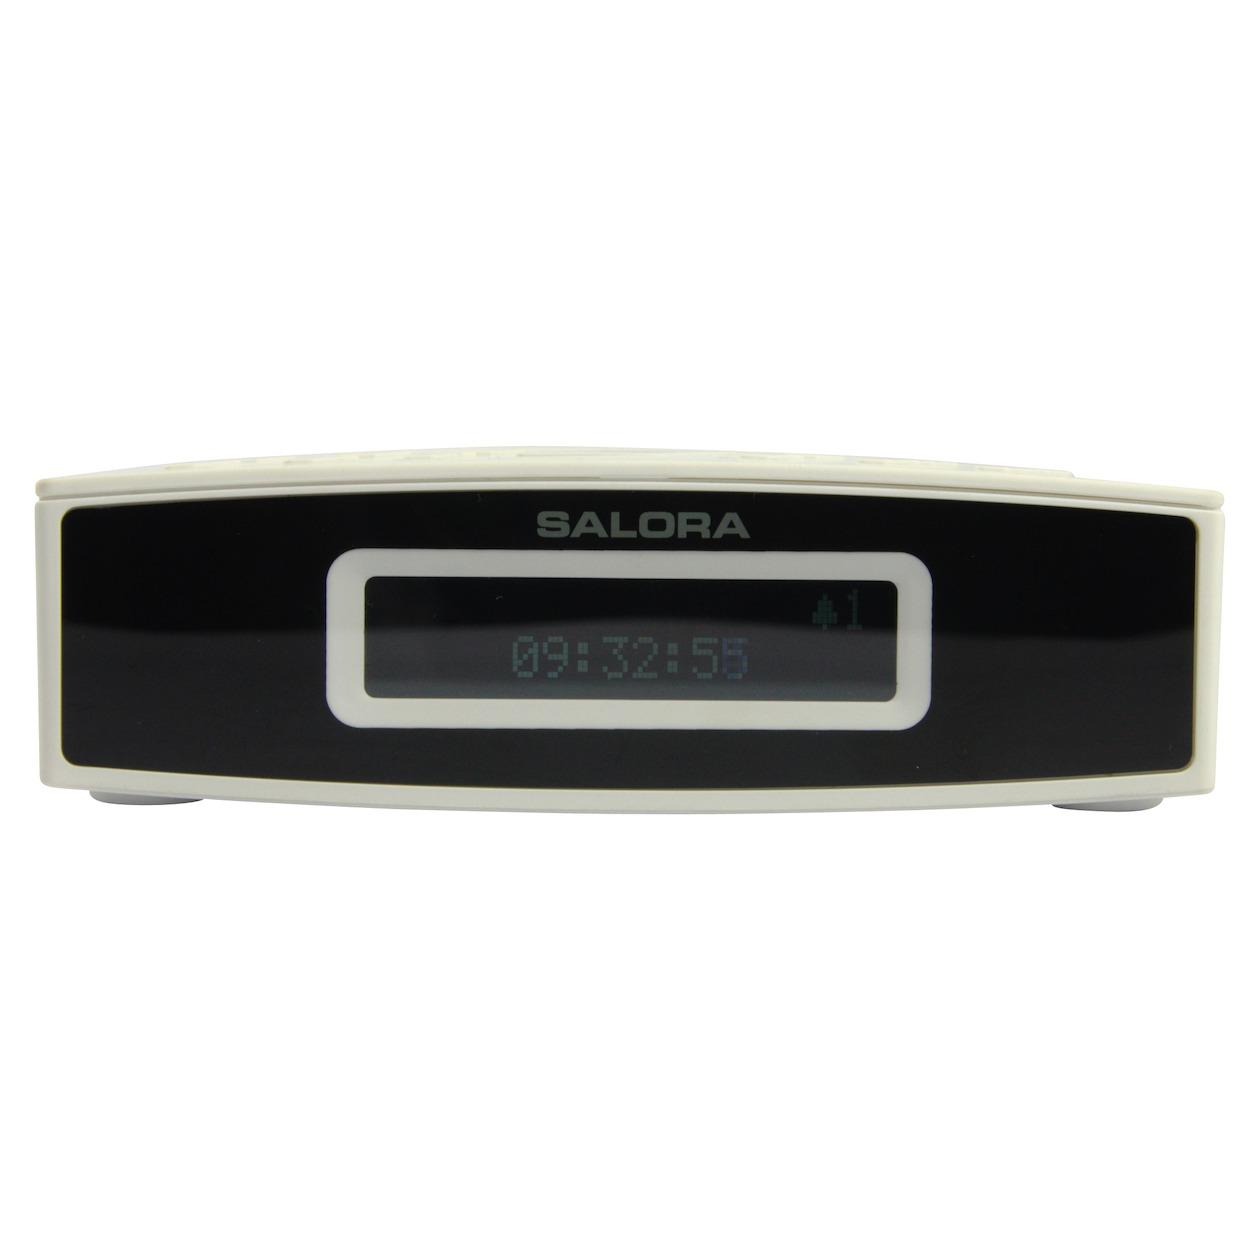 Salora DAB-DAB+-FM, LED display, 400g (CR624DAB)